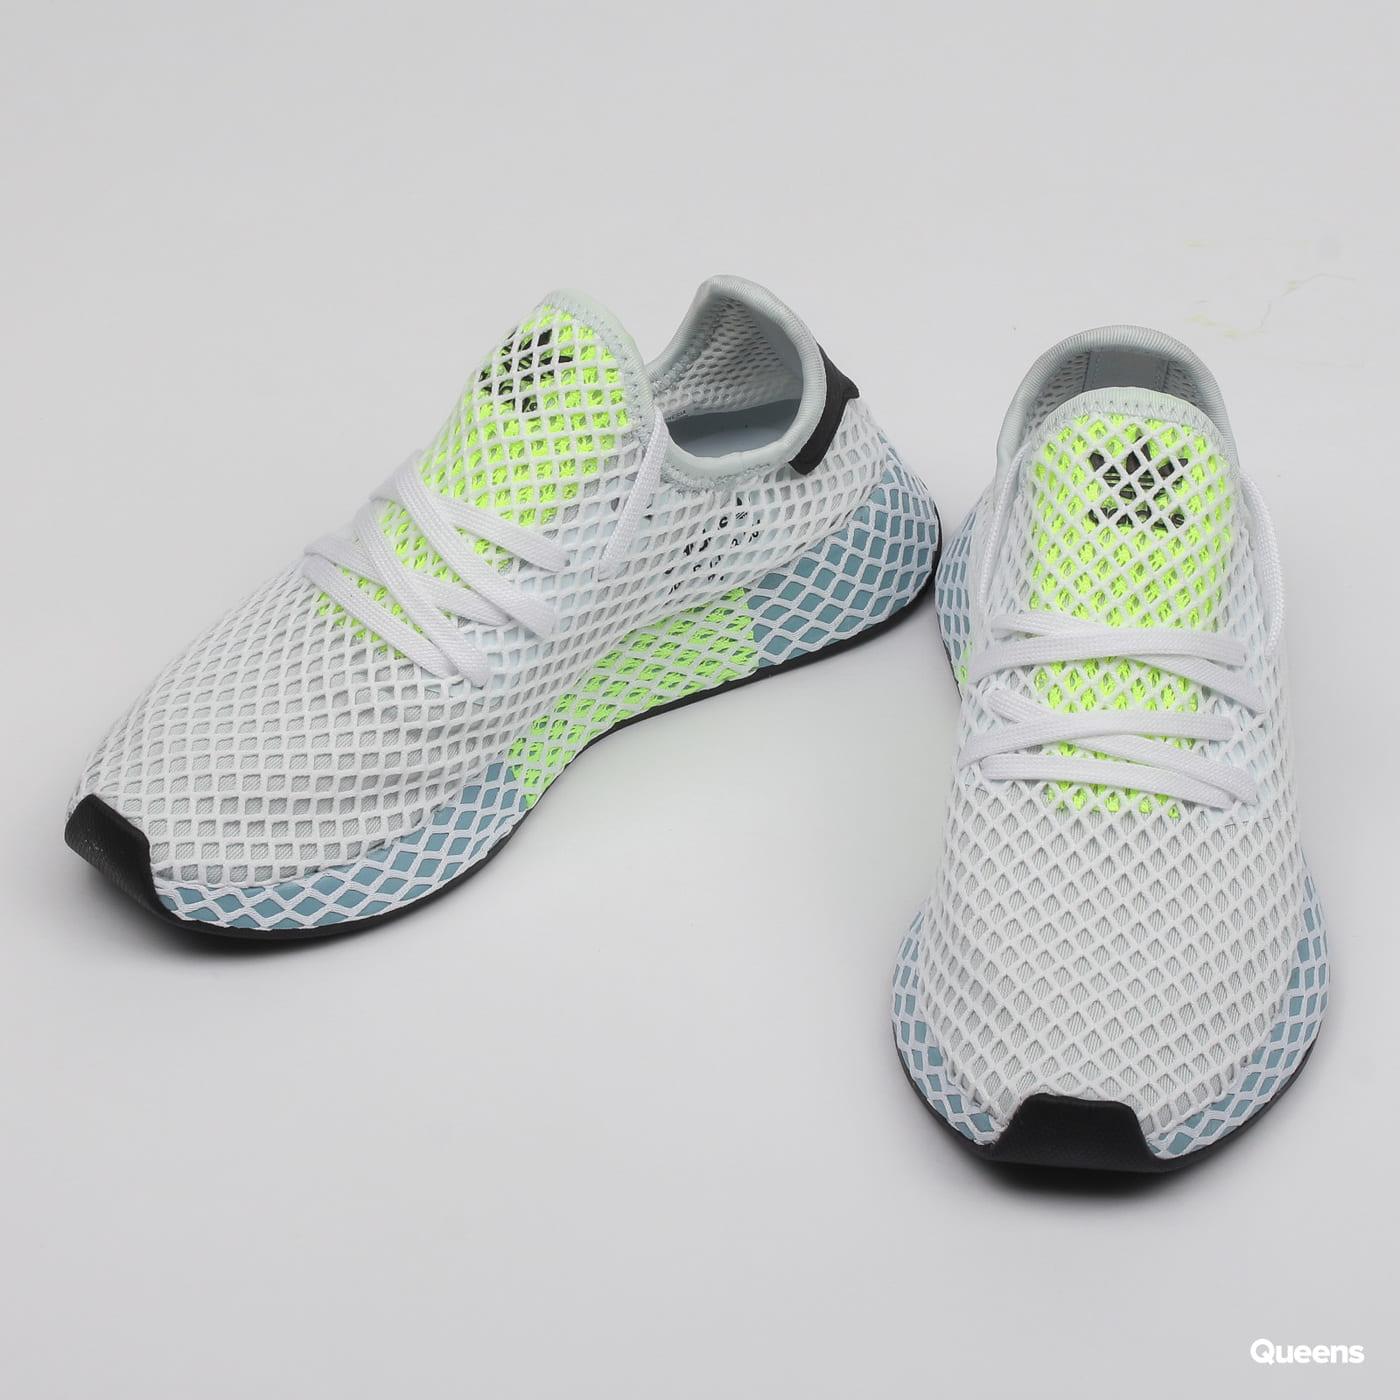 f784929a7f617 Zväčšiť Zväčšiť Zväčšiť Zväčšiť Zväčšiť. adidas Originals Deerupt Runner W  blutin / ashgre / hireye